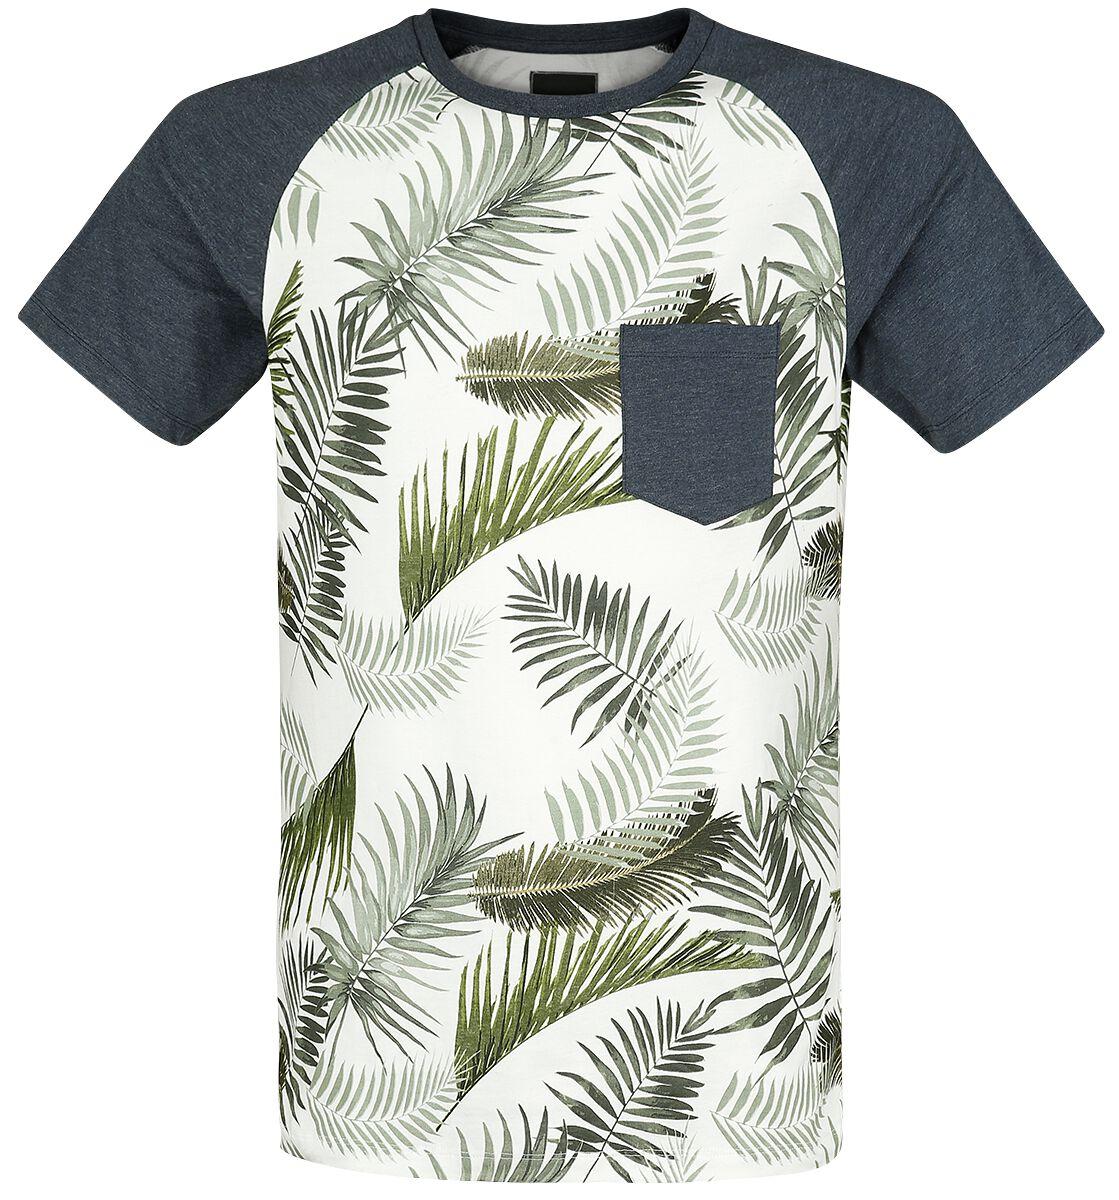 Marki - Koszulki - T-Shirt Produkt Palm Raglan Tee T-Shirt granatowy - 365803